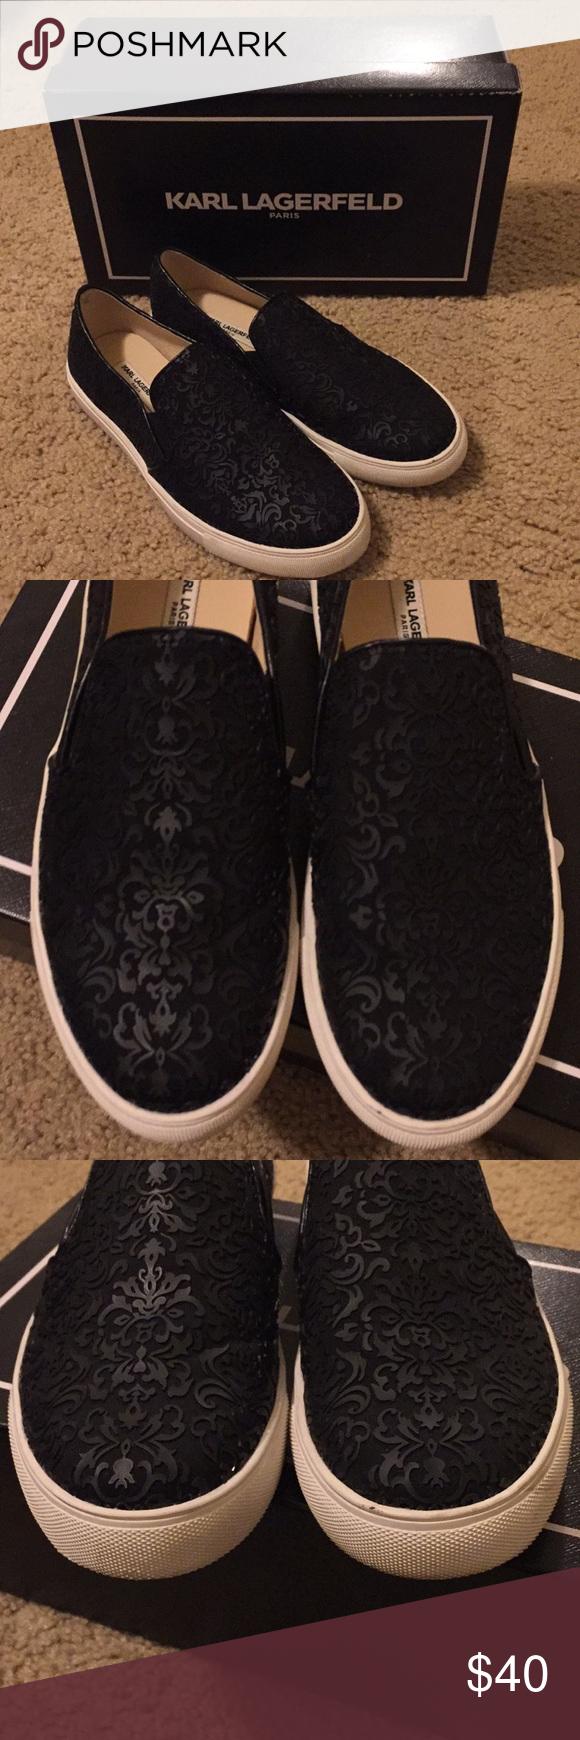 0c3a4f39df9 Karl Lagerfeld Estella8 Shoes Size 7